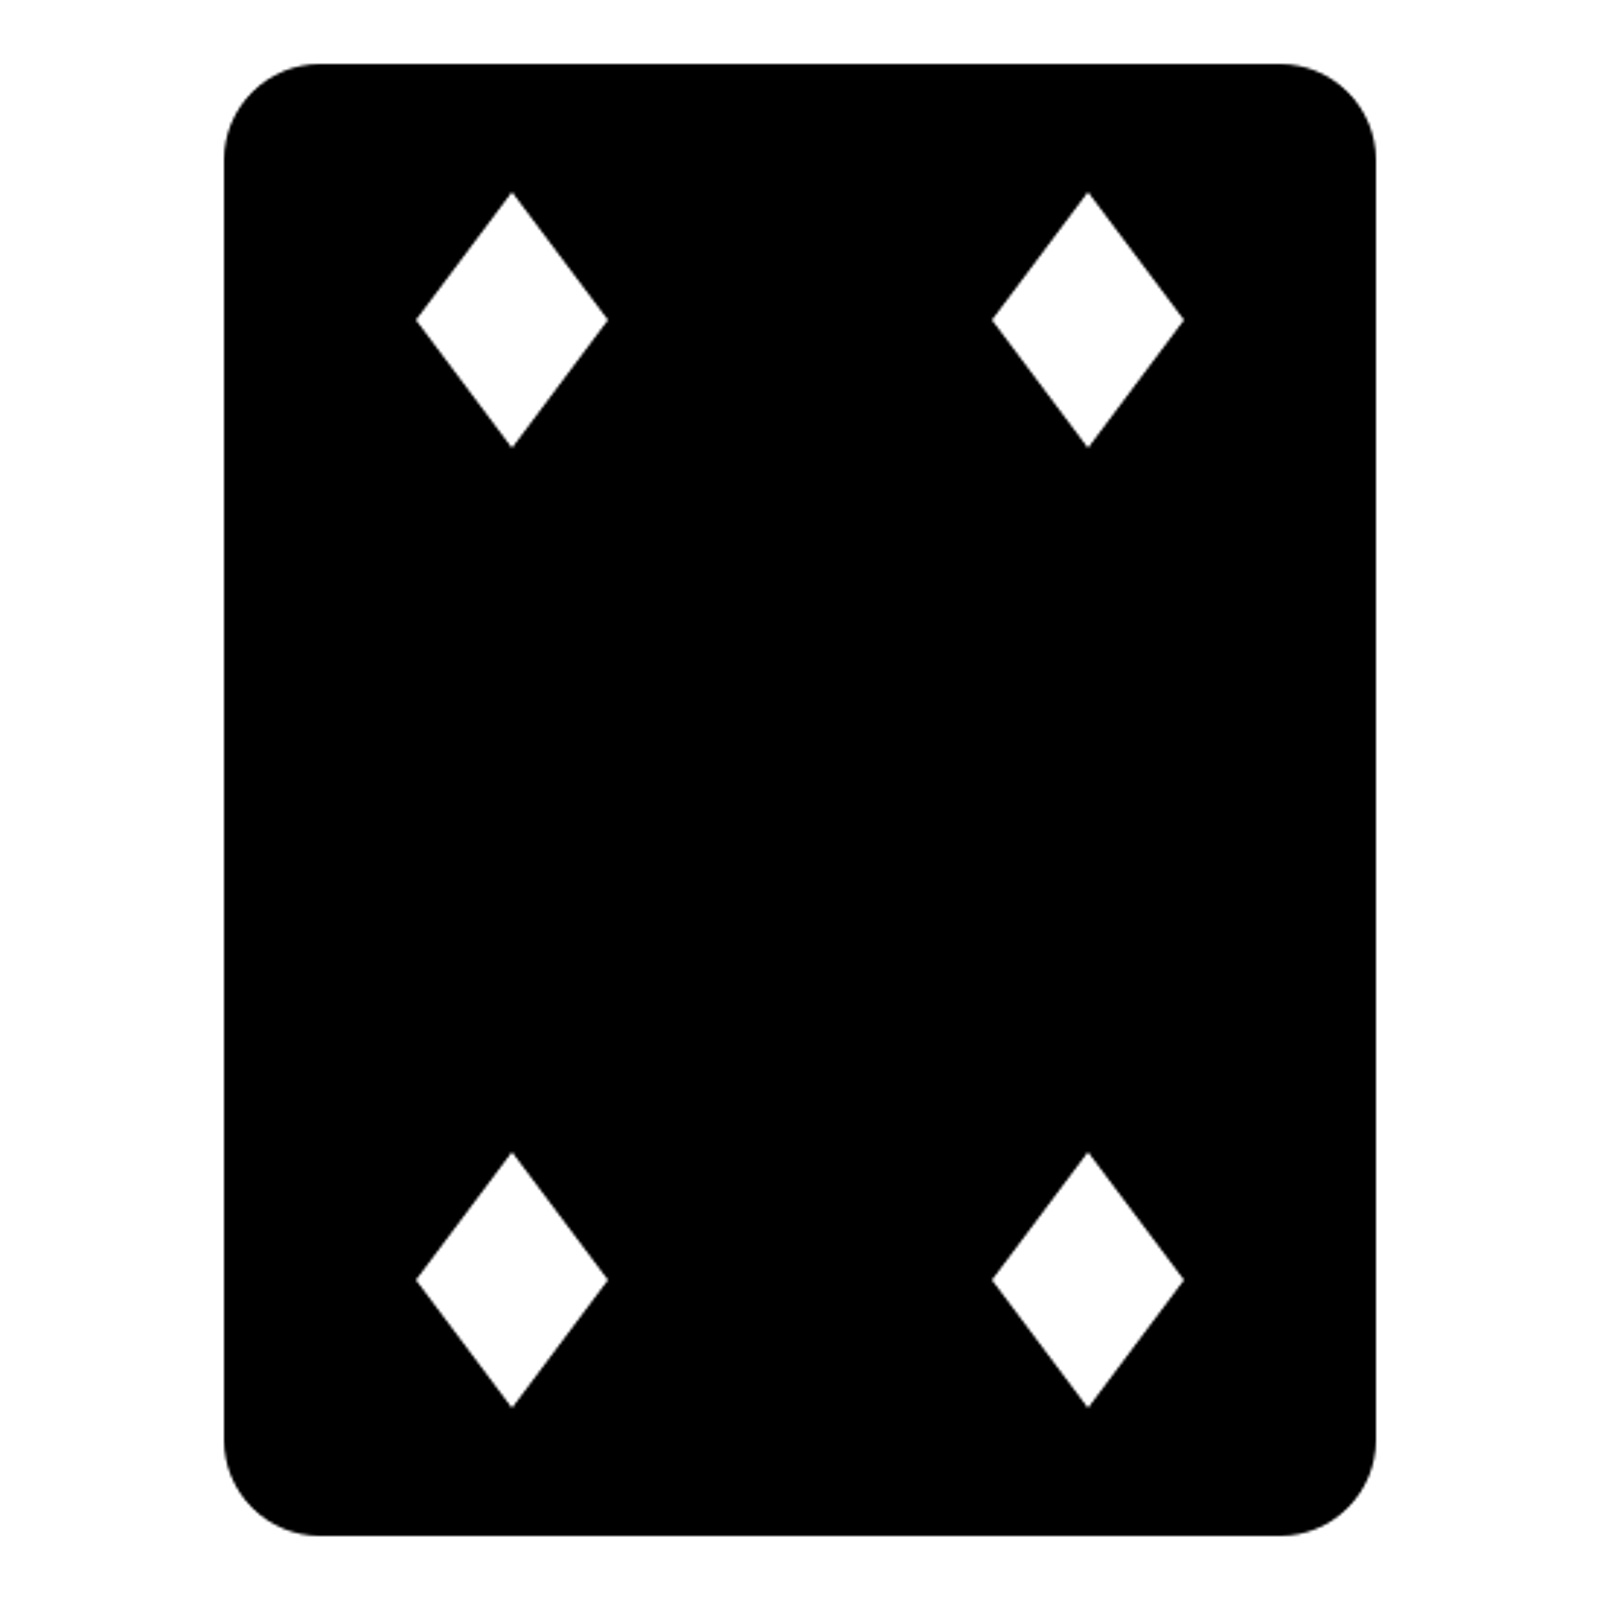 4 of Diamonds Filled icon